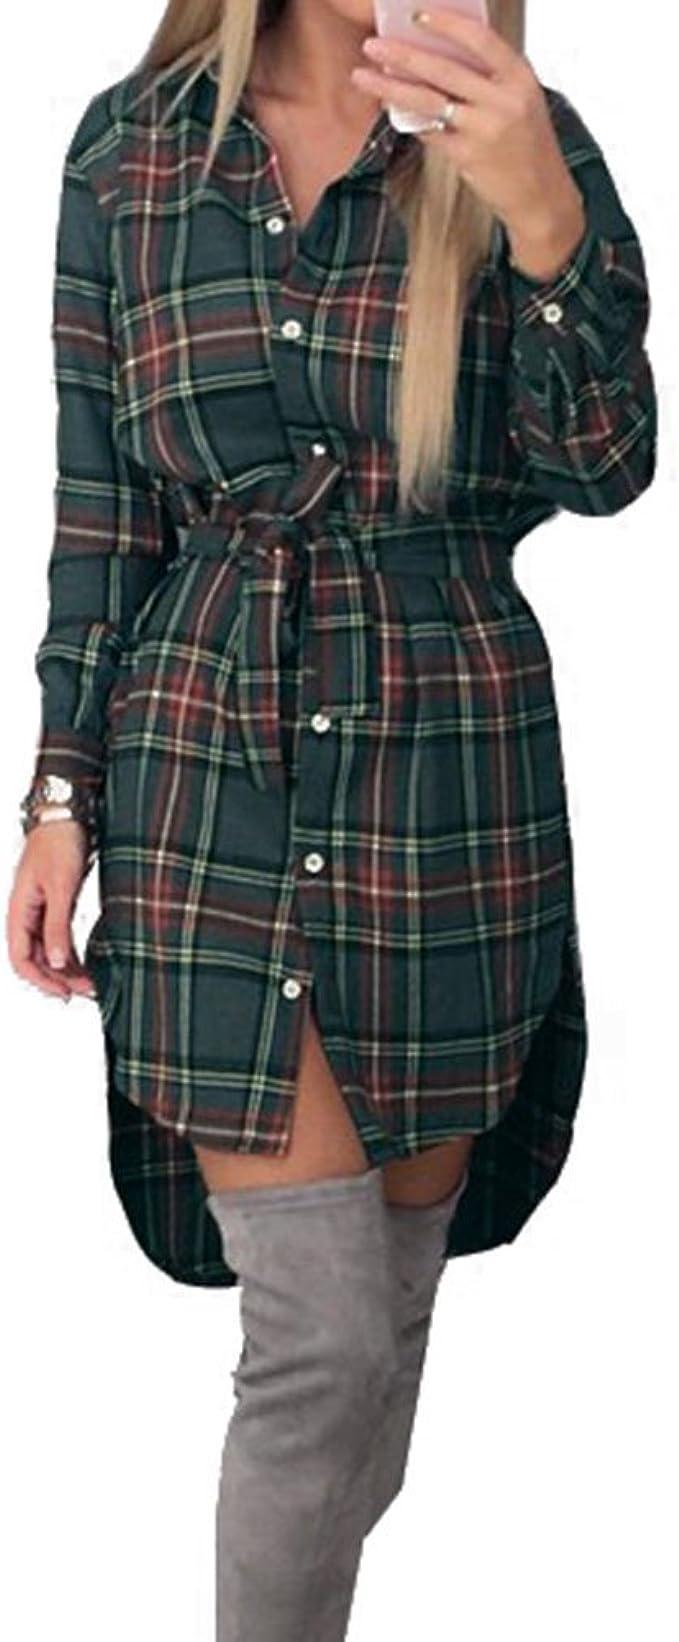 Mujer Vestir Irregular Dobladillo Camisa - Tartán Vestir Señoras Largo Manga Blusa Sobredimensionado Tops Comprobado Camisa Mini Vestir Moda Sayo ...